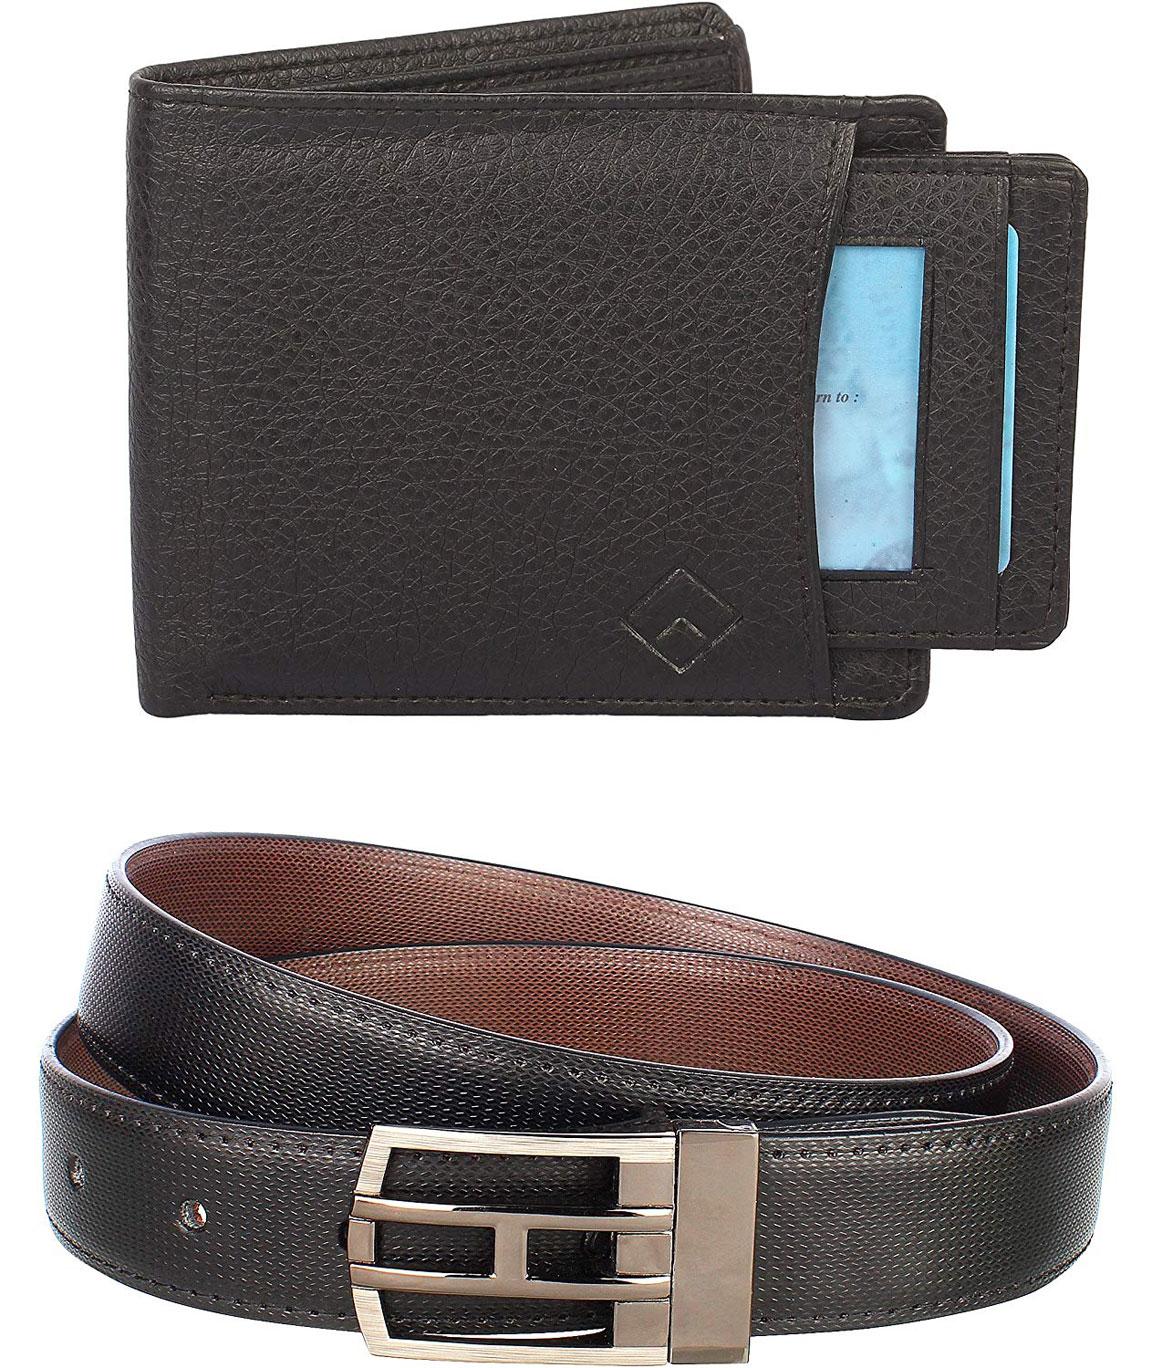 Urban Alfami Reversible Belt and Black External Card Slot Wallet Combo